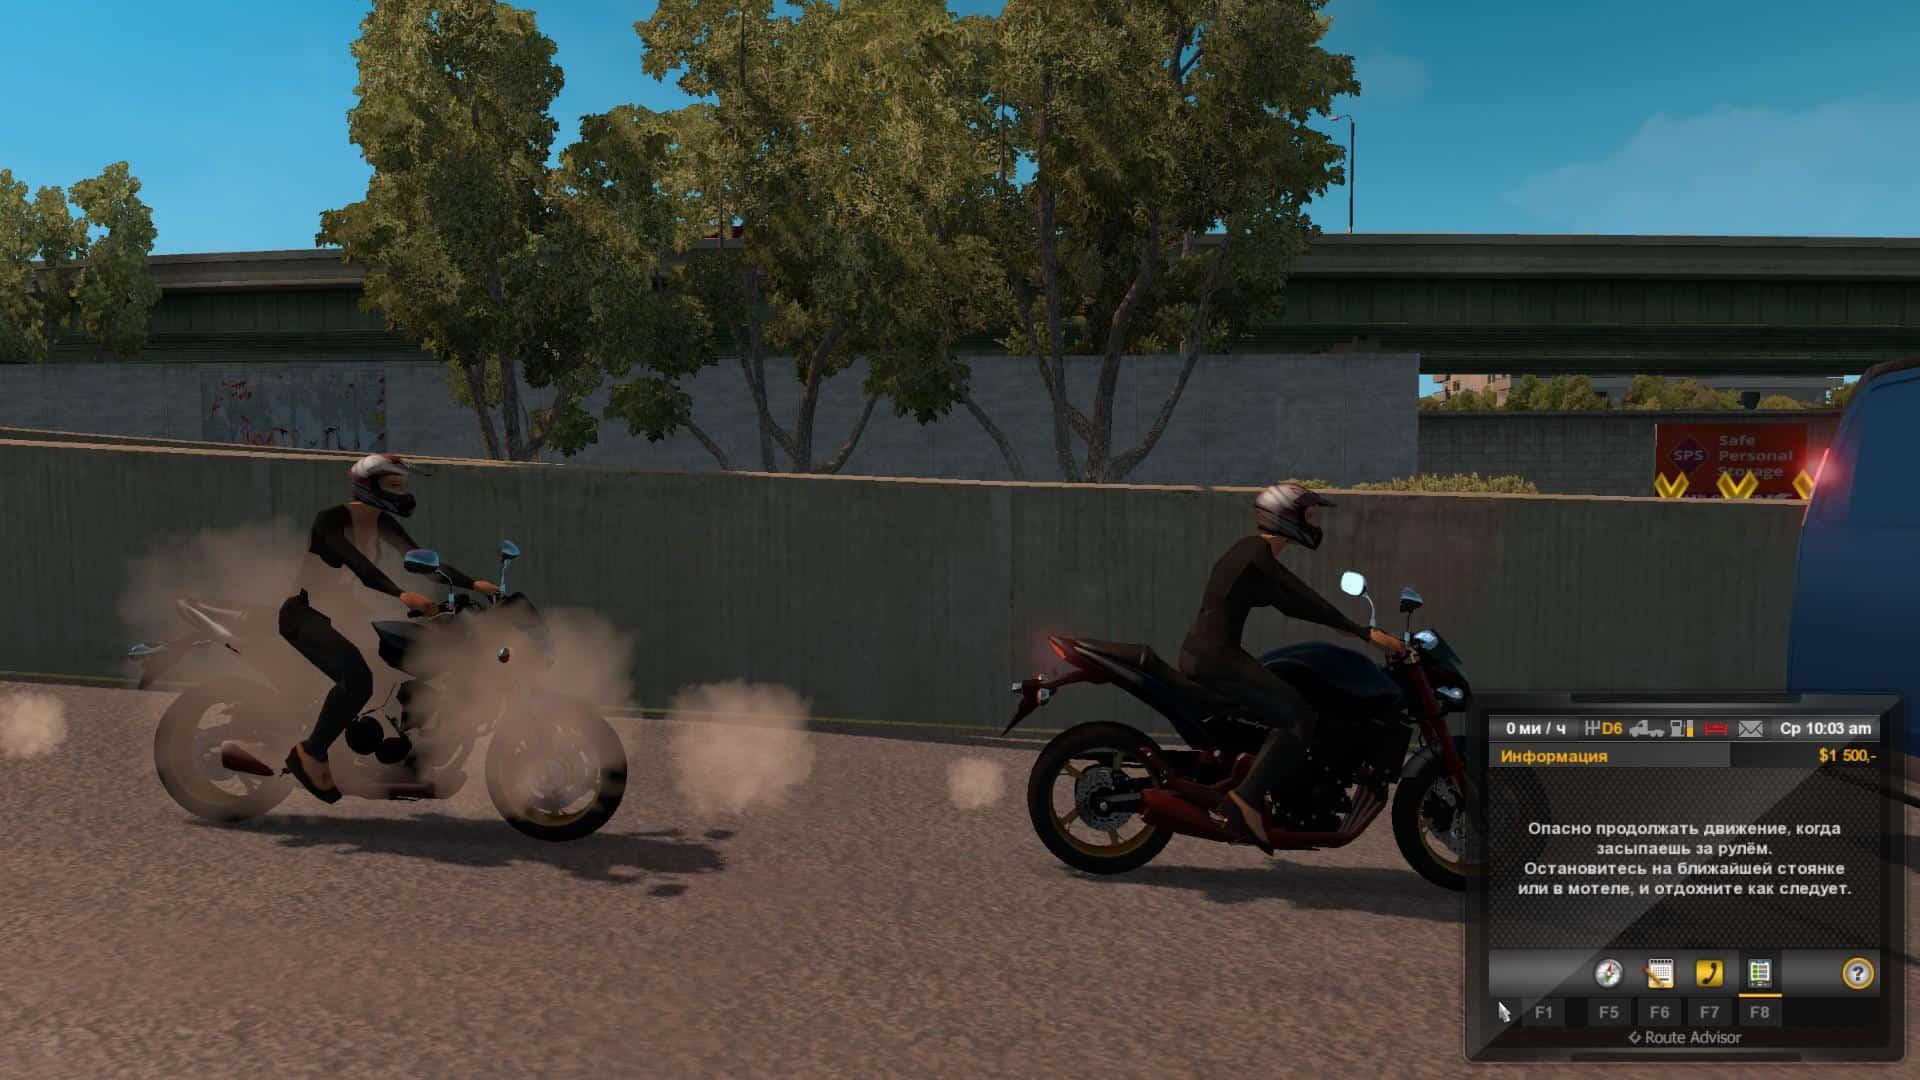 MOTORCYCLE IN TRAFFIC V1 0 0 MOD - American Truck Simulator